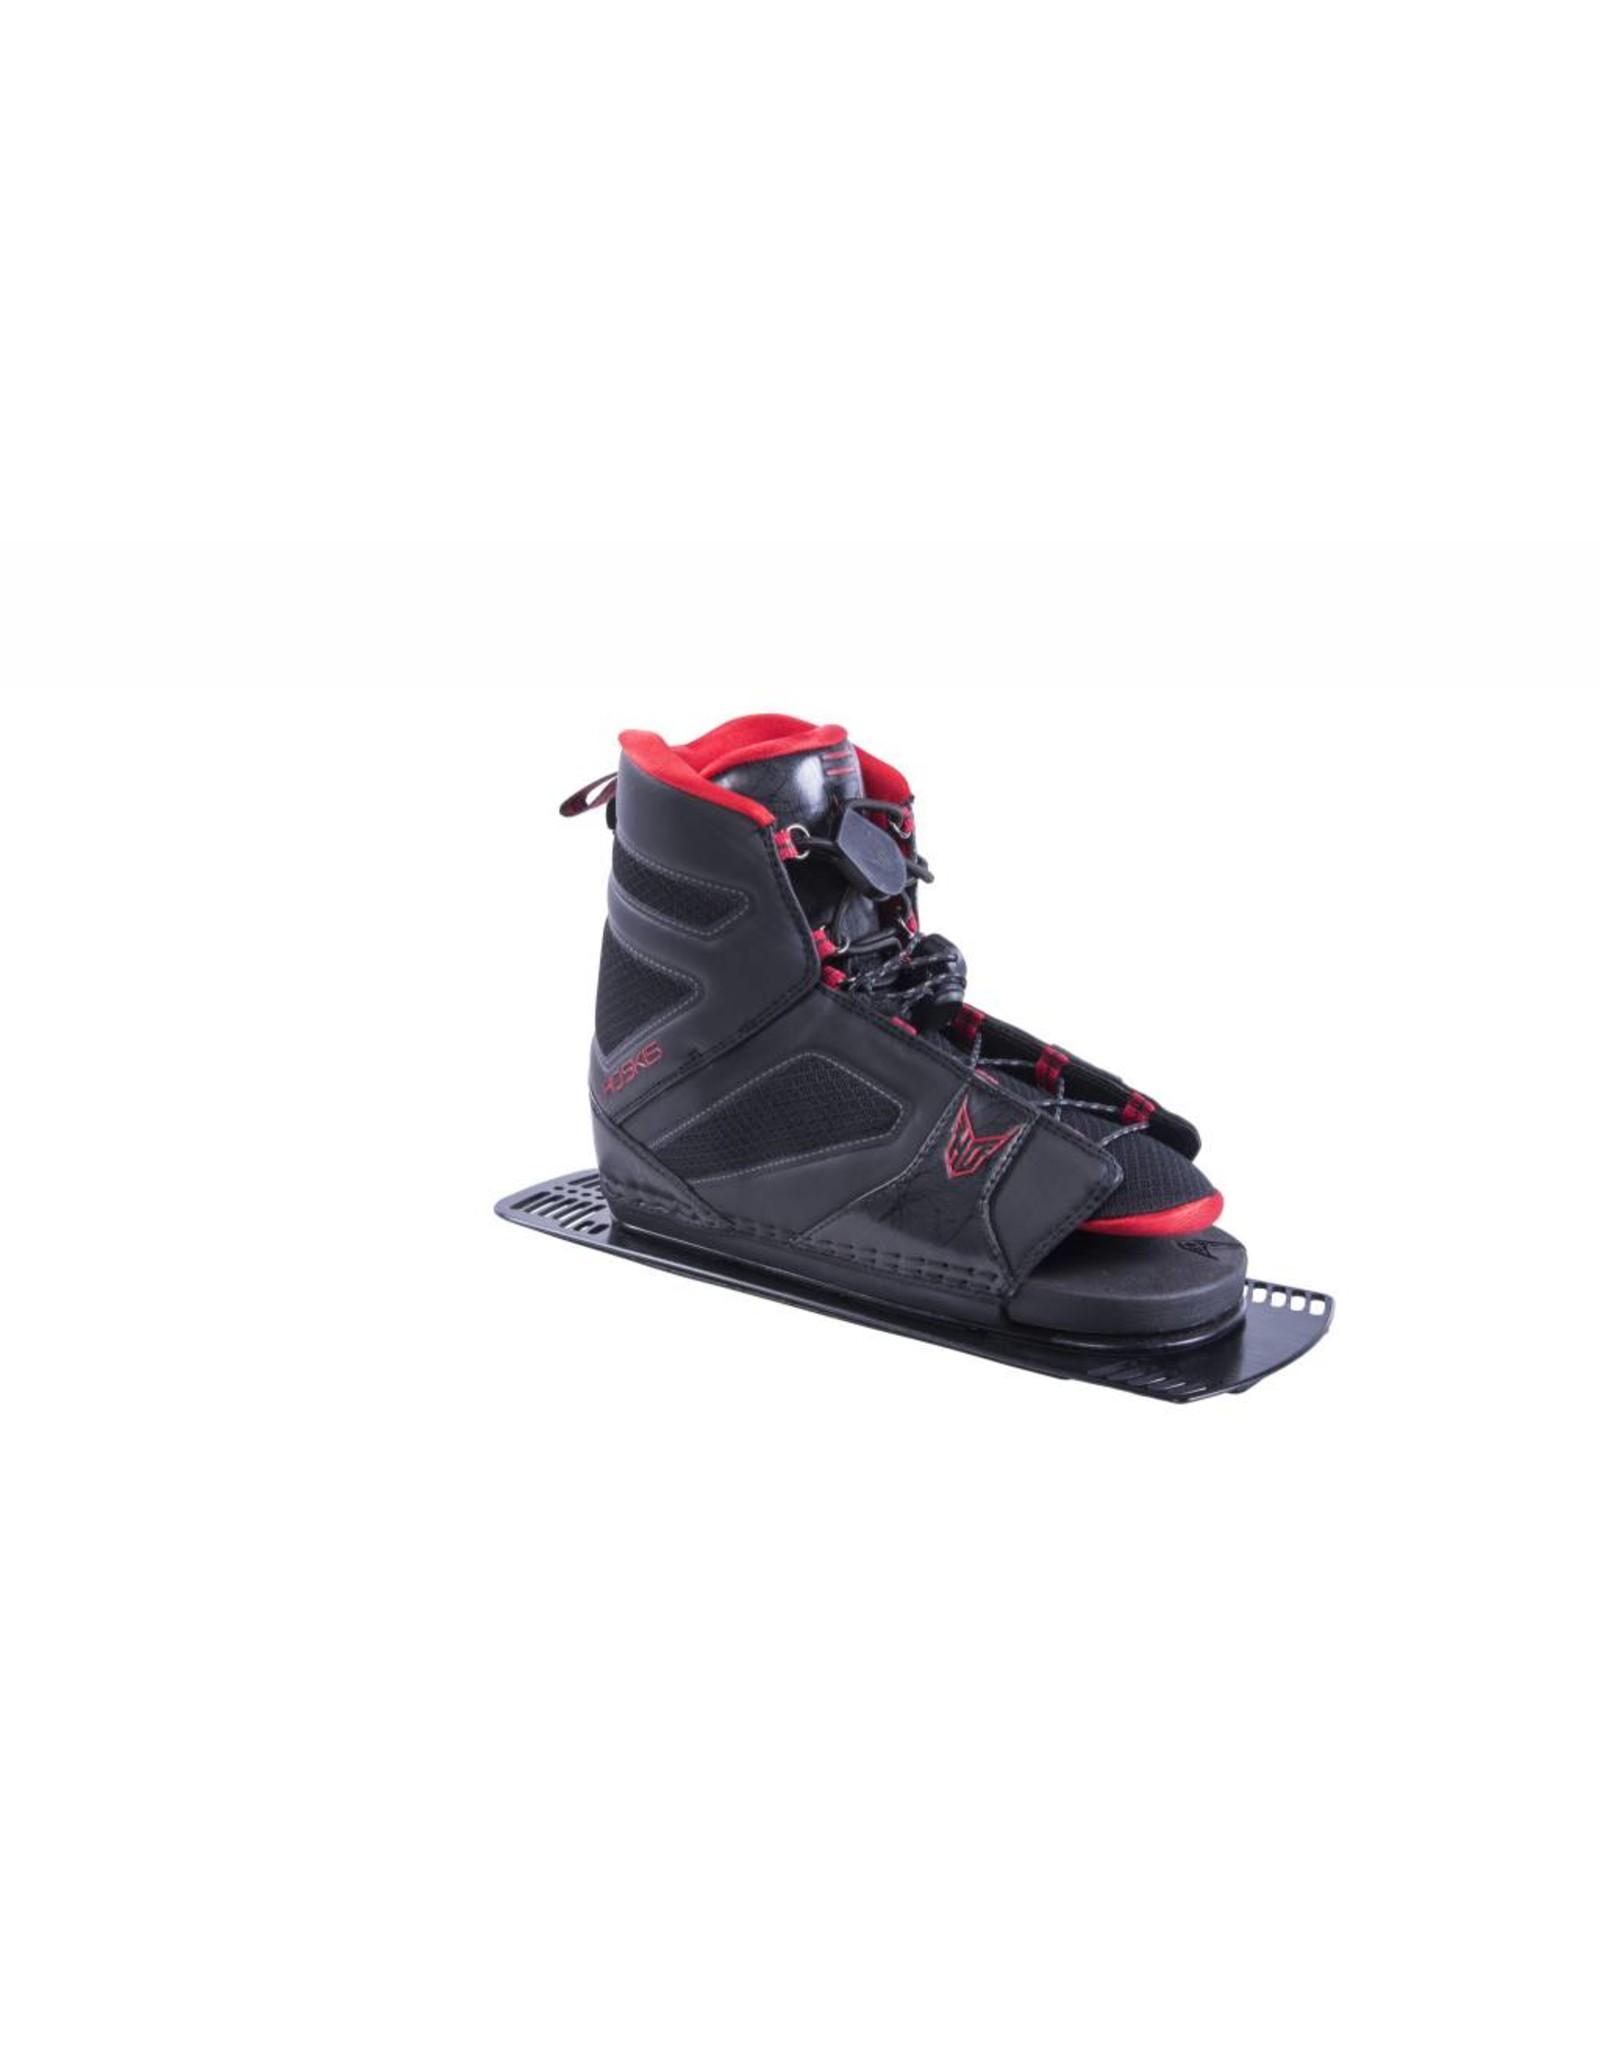 HO FreeMAX Slalom Ski Boot 2018